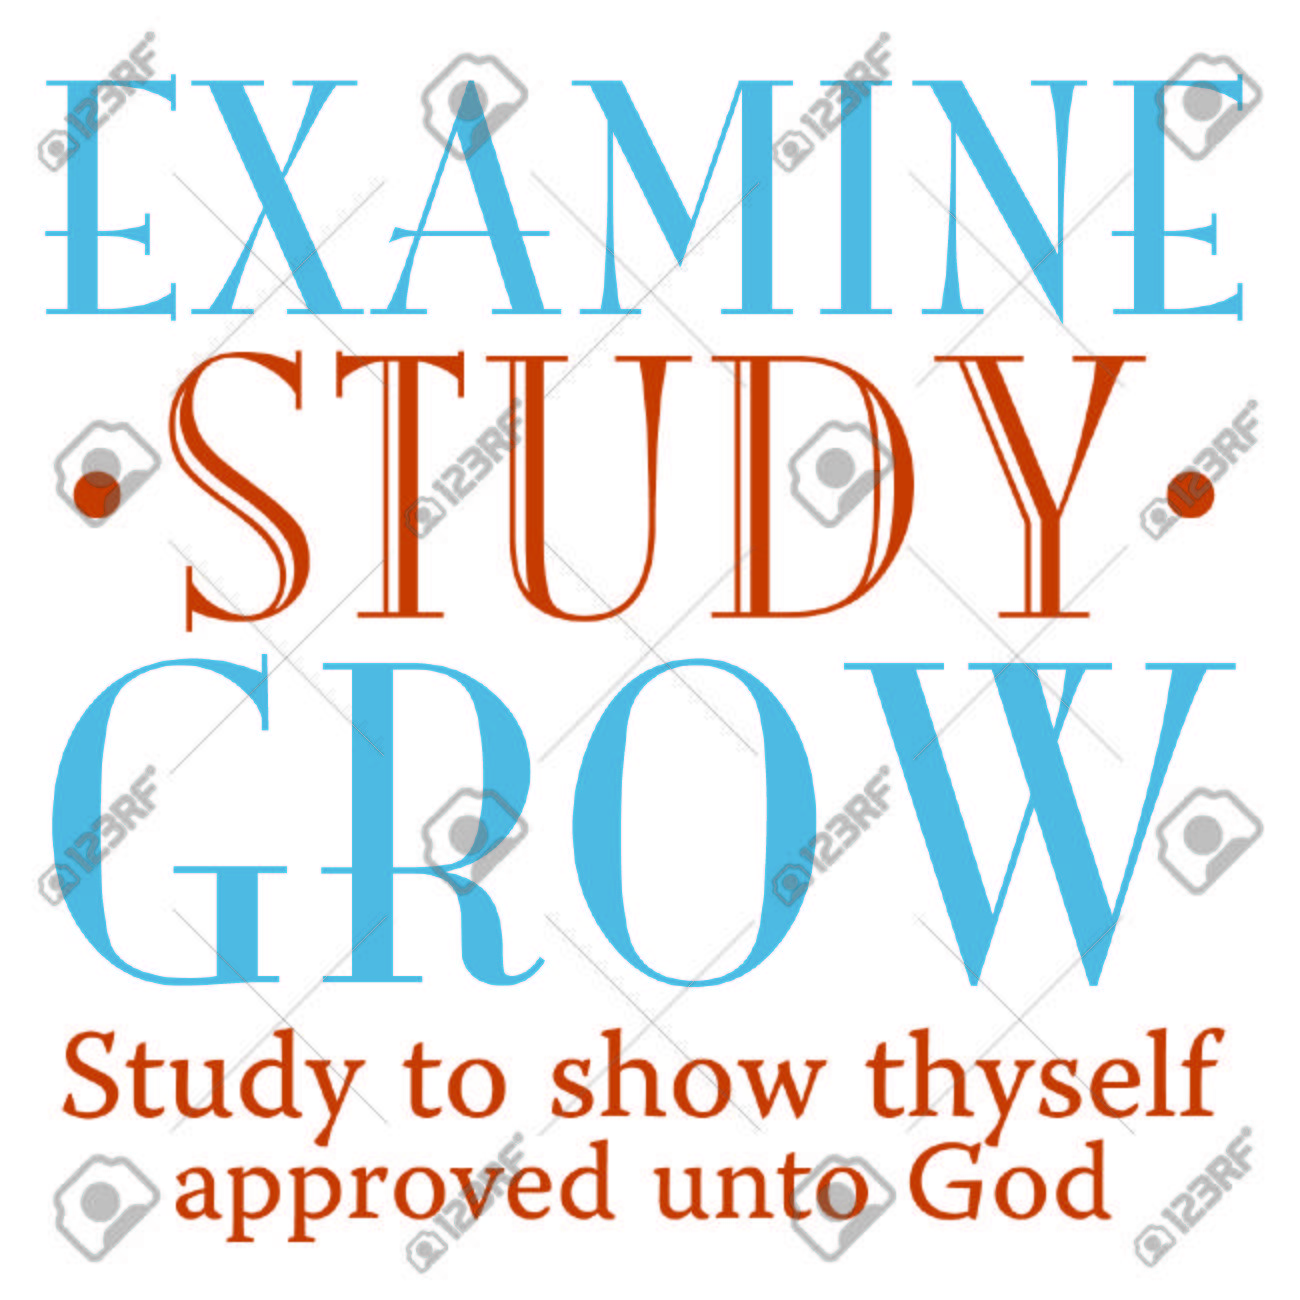 examine study grow inspirational scripture typography royalty free